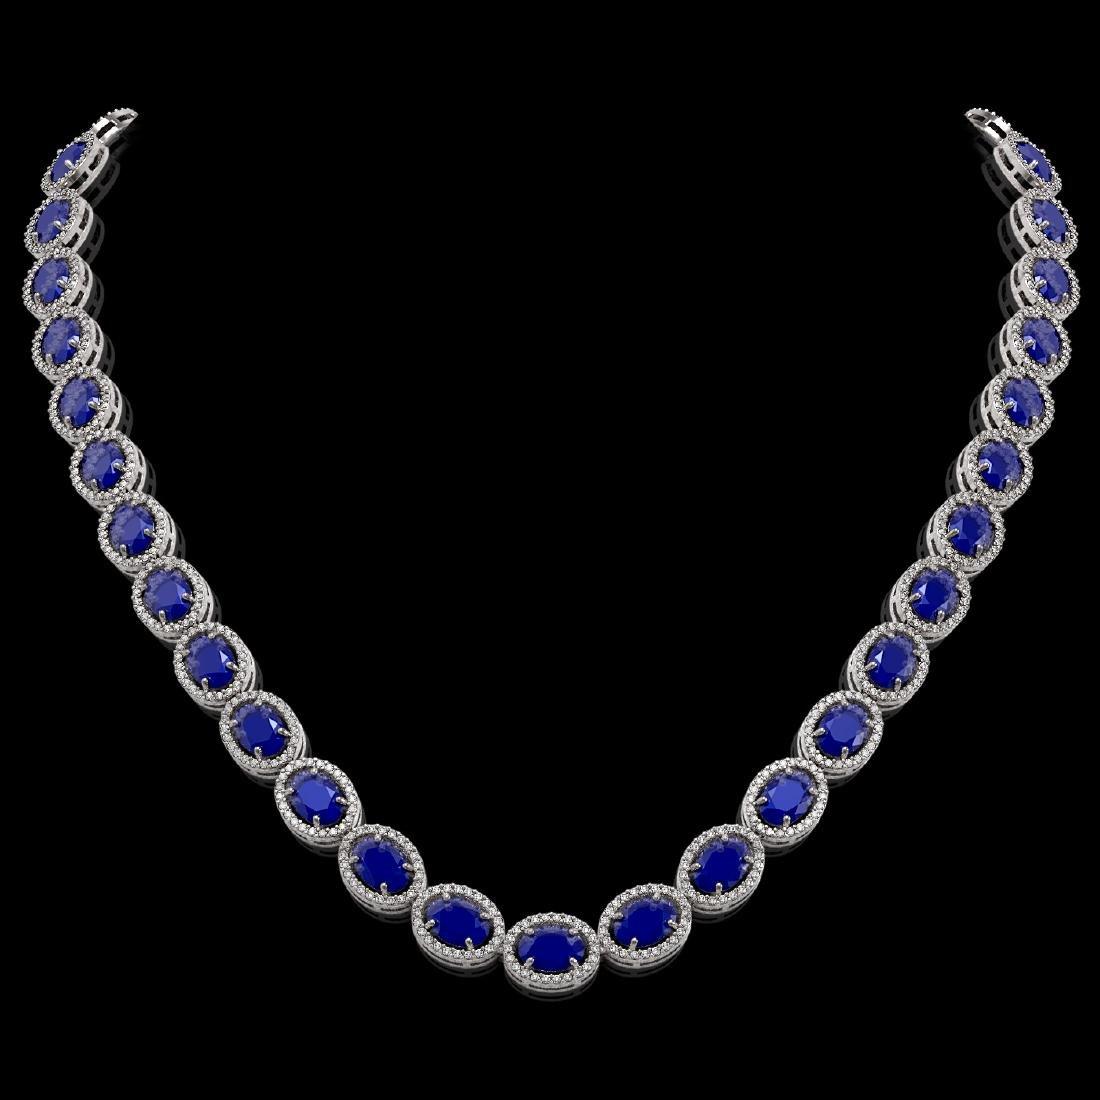 52.15 CTW Sapphire & Diamond Halo Necklace 10K White